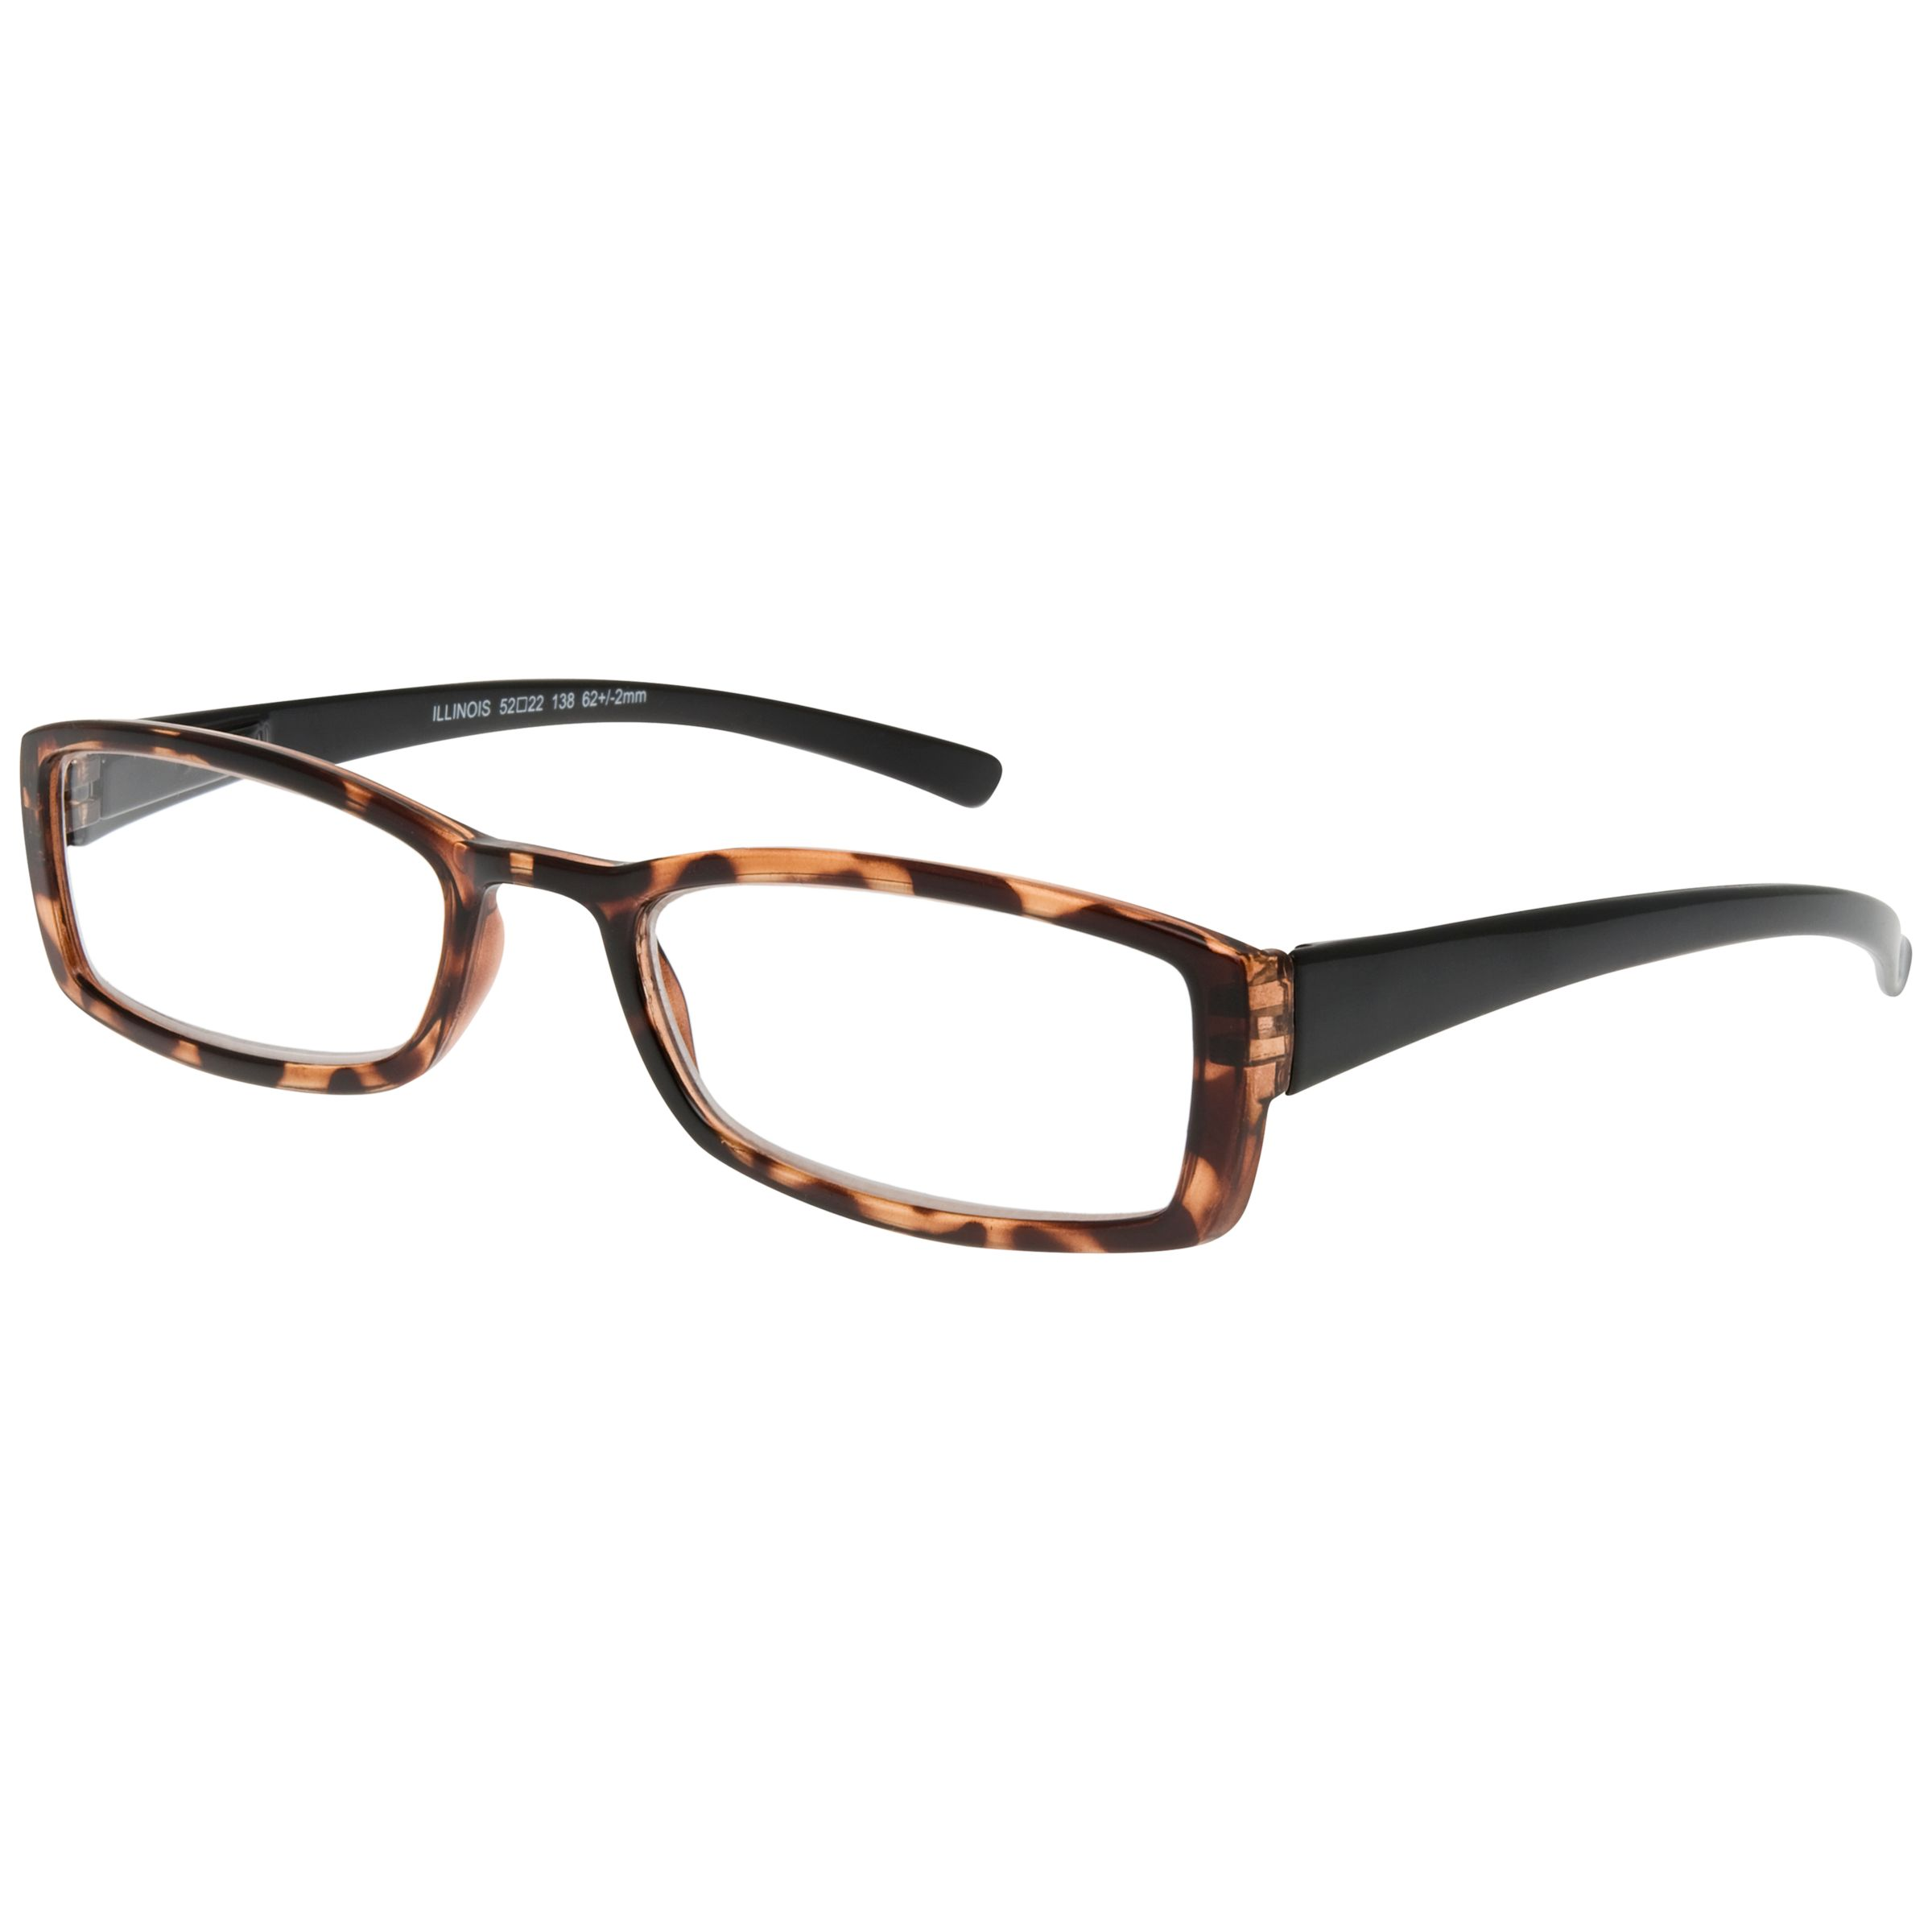 Magnif Eyes Magnif Eyes Unisex Ready Readers Illinois Glasses, Shell